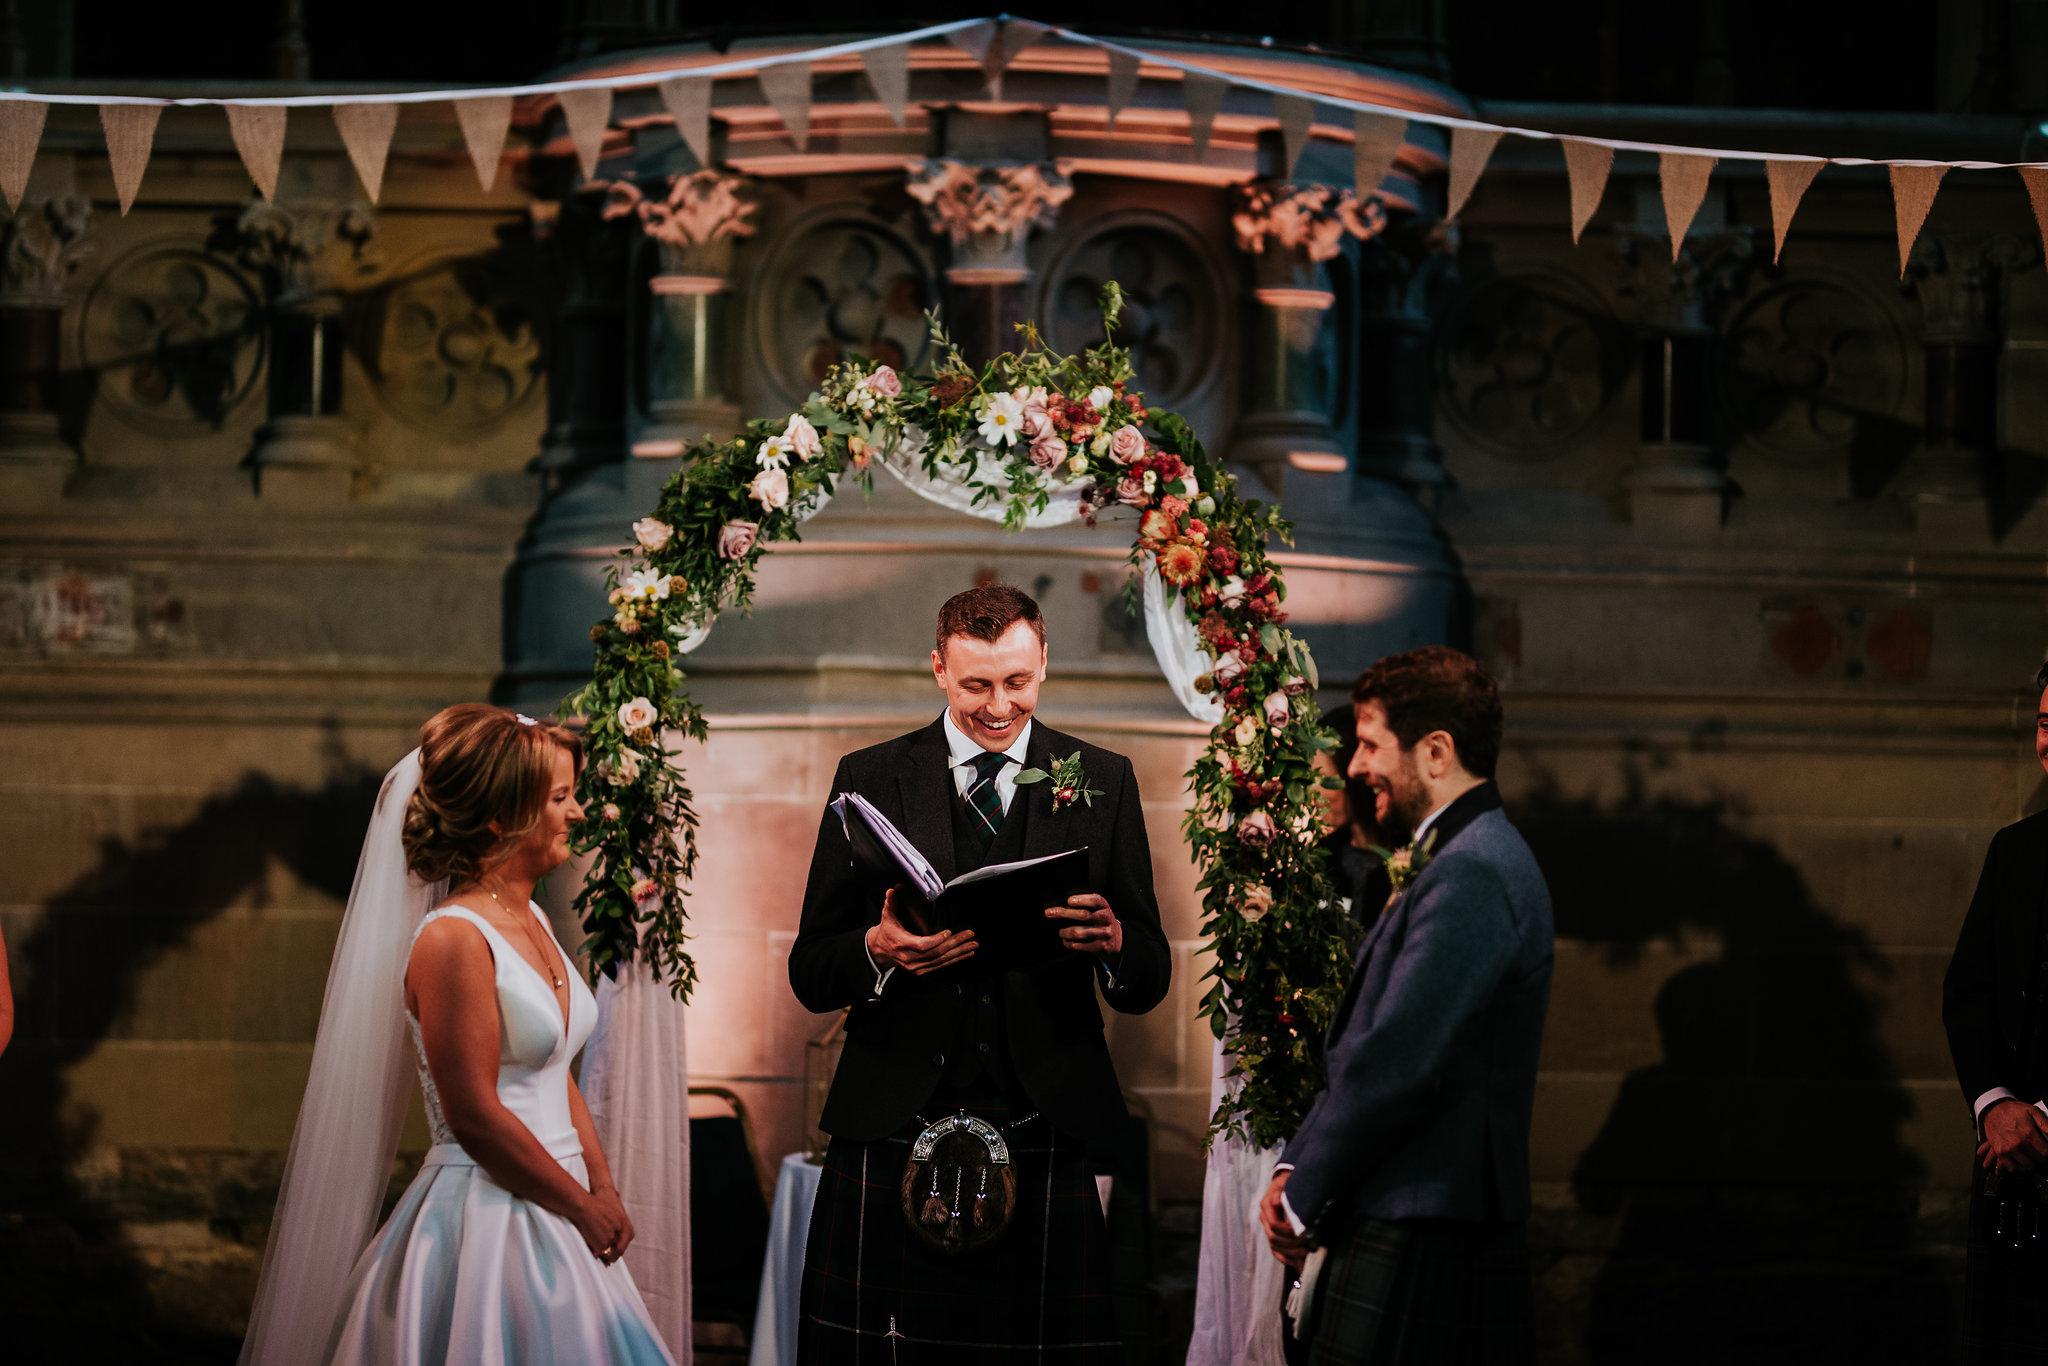 Cottiers wedding lavender and rose wedding florists scotland6.jpg